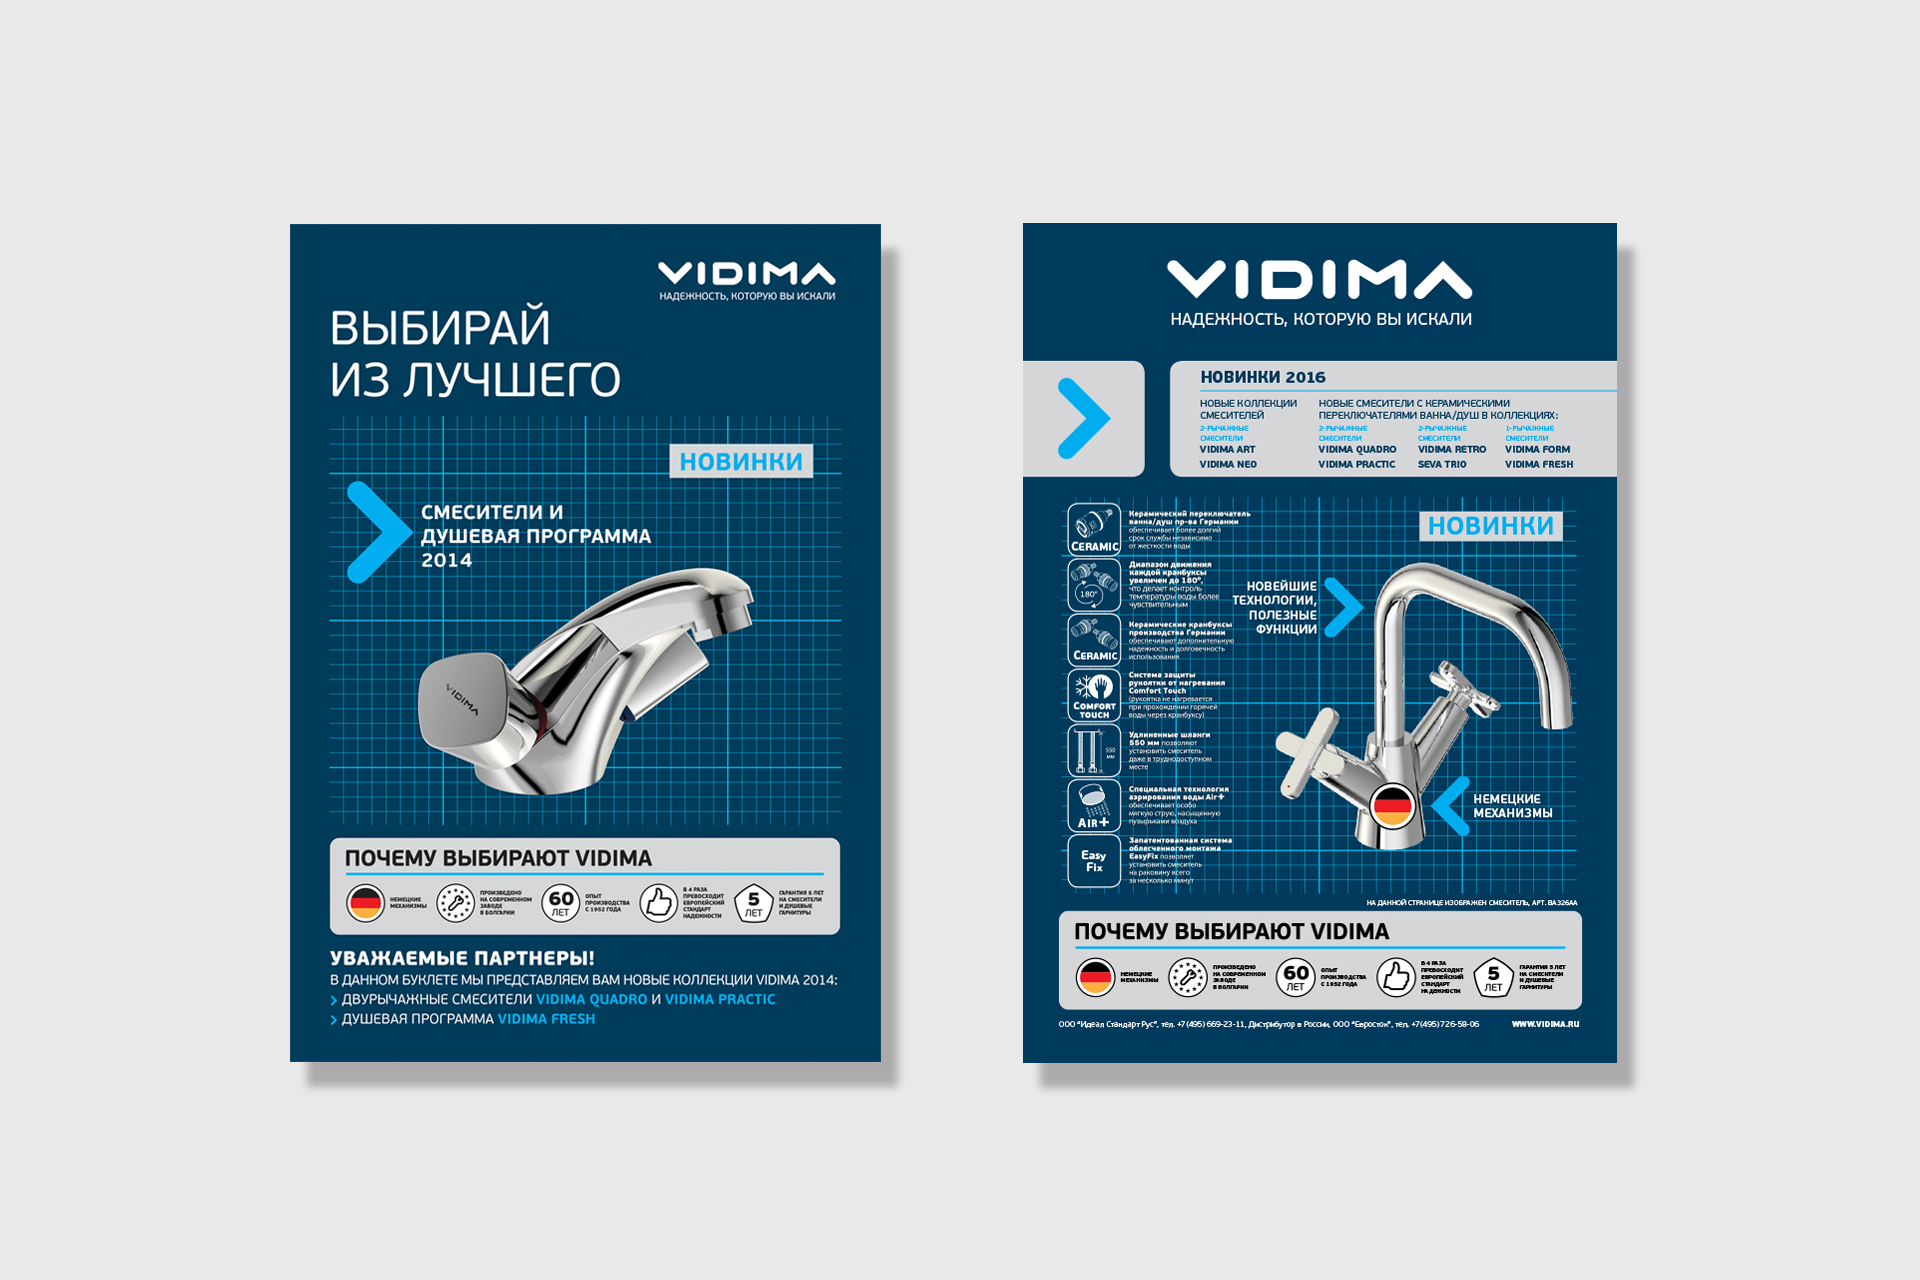 VIDIMA _broshuri_1